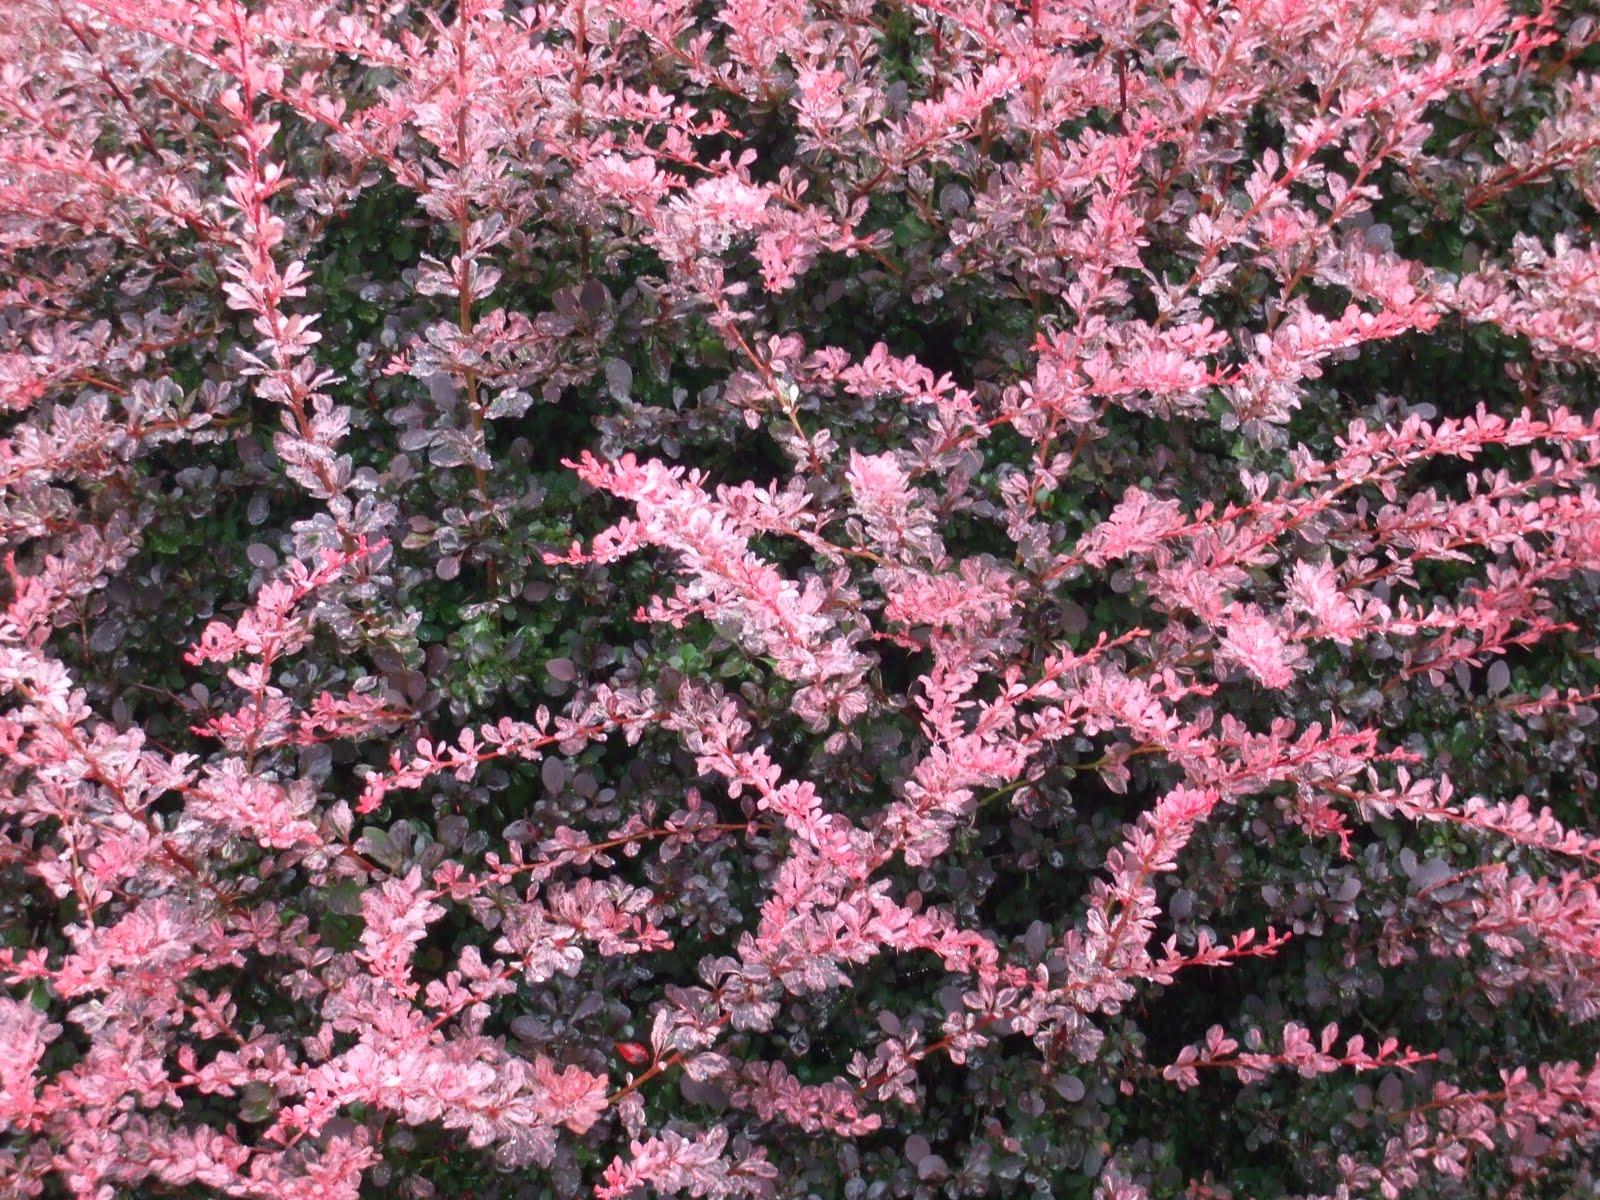 Spirea Bush Varieties